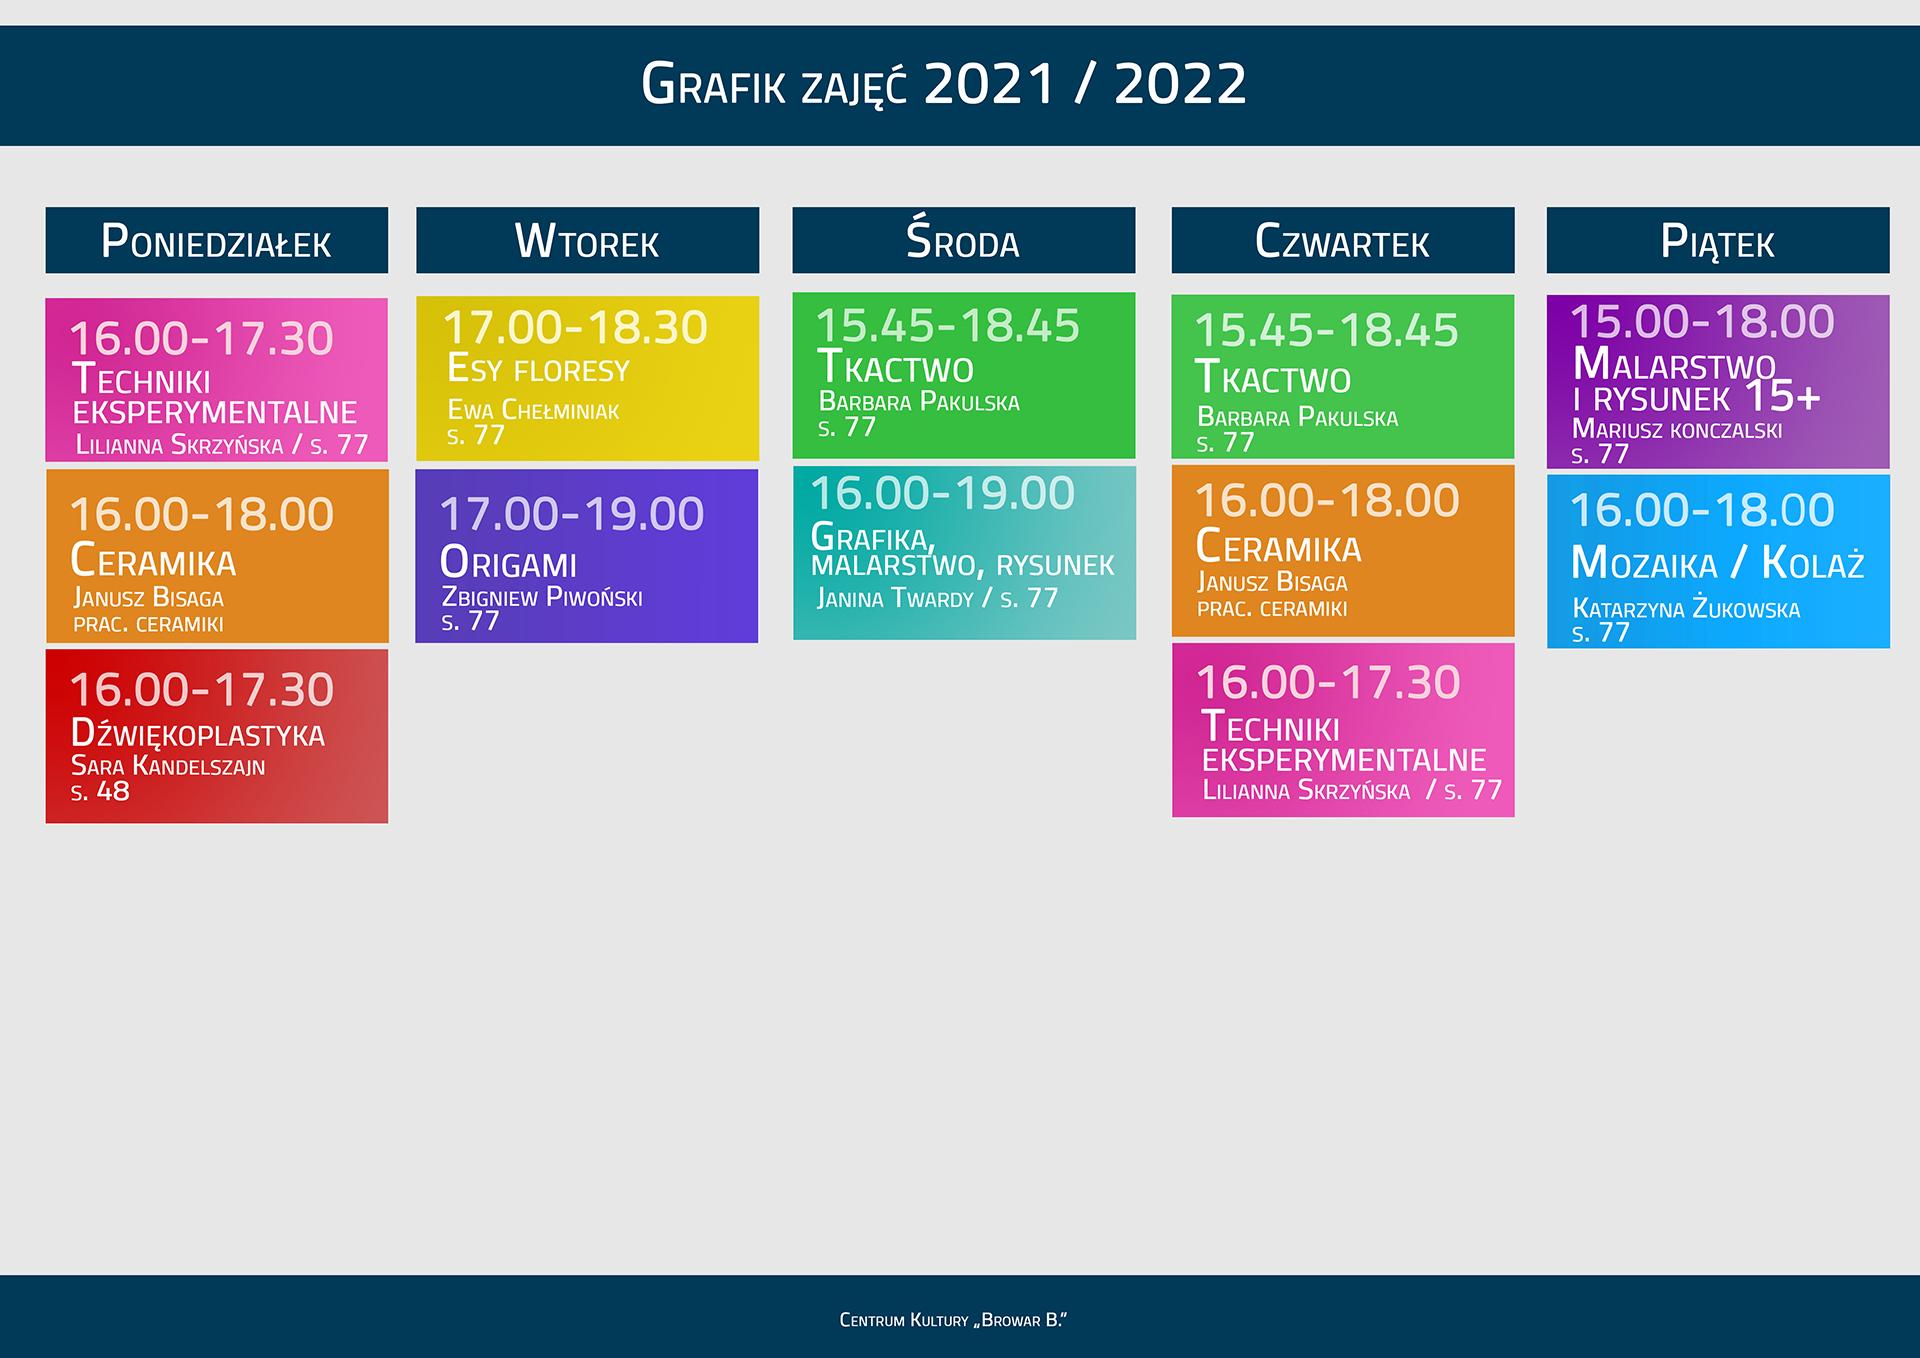 GRAFIK ZAJEC PEP 2021-22